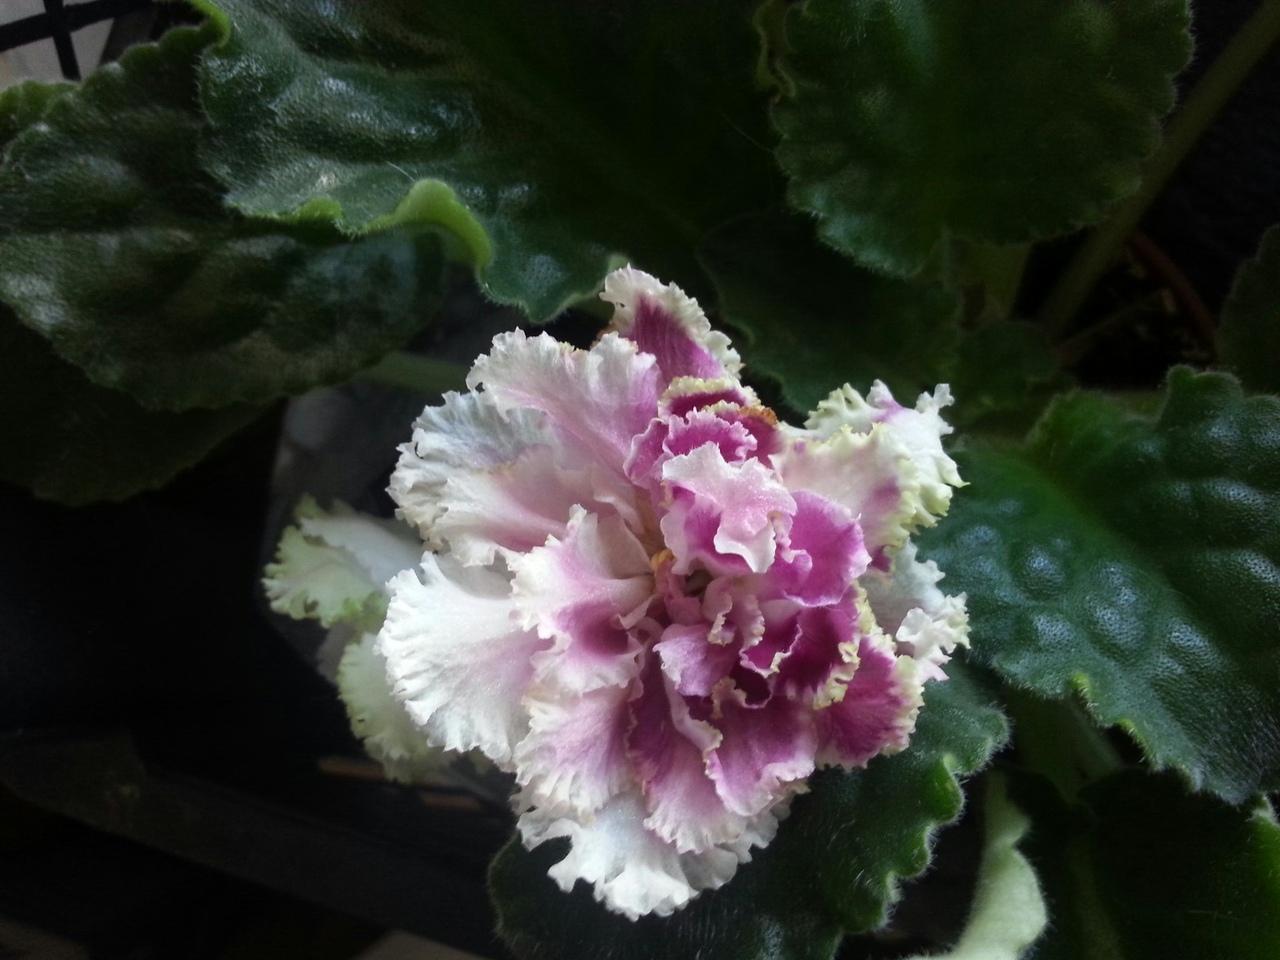 РС - Ледяная Роза (Репкина)  EmJK2i-A96s